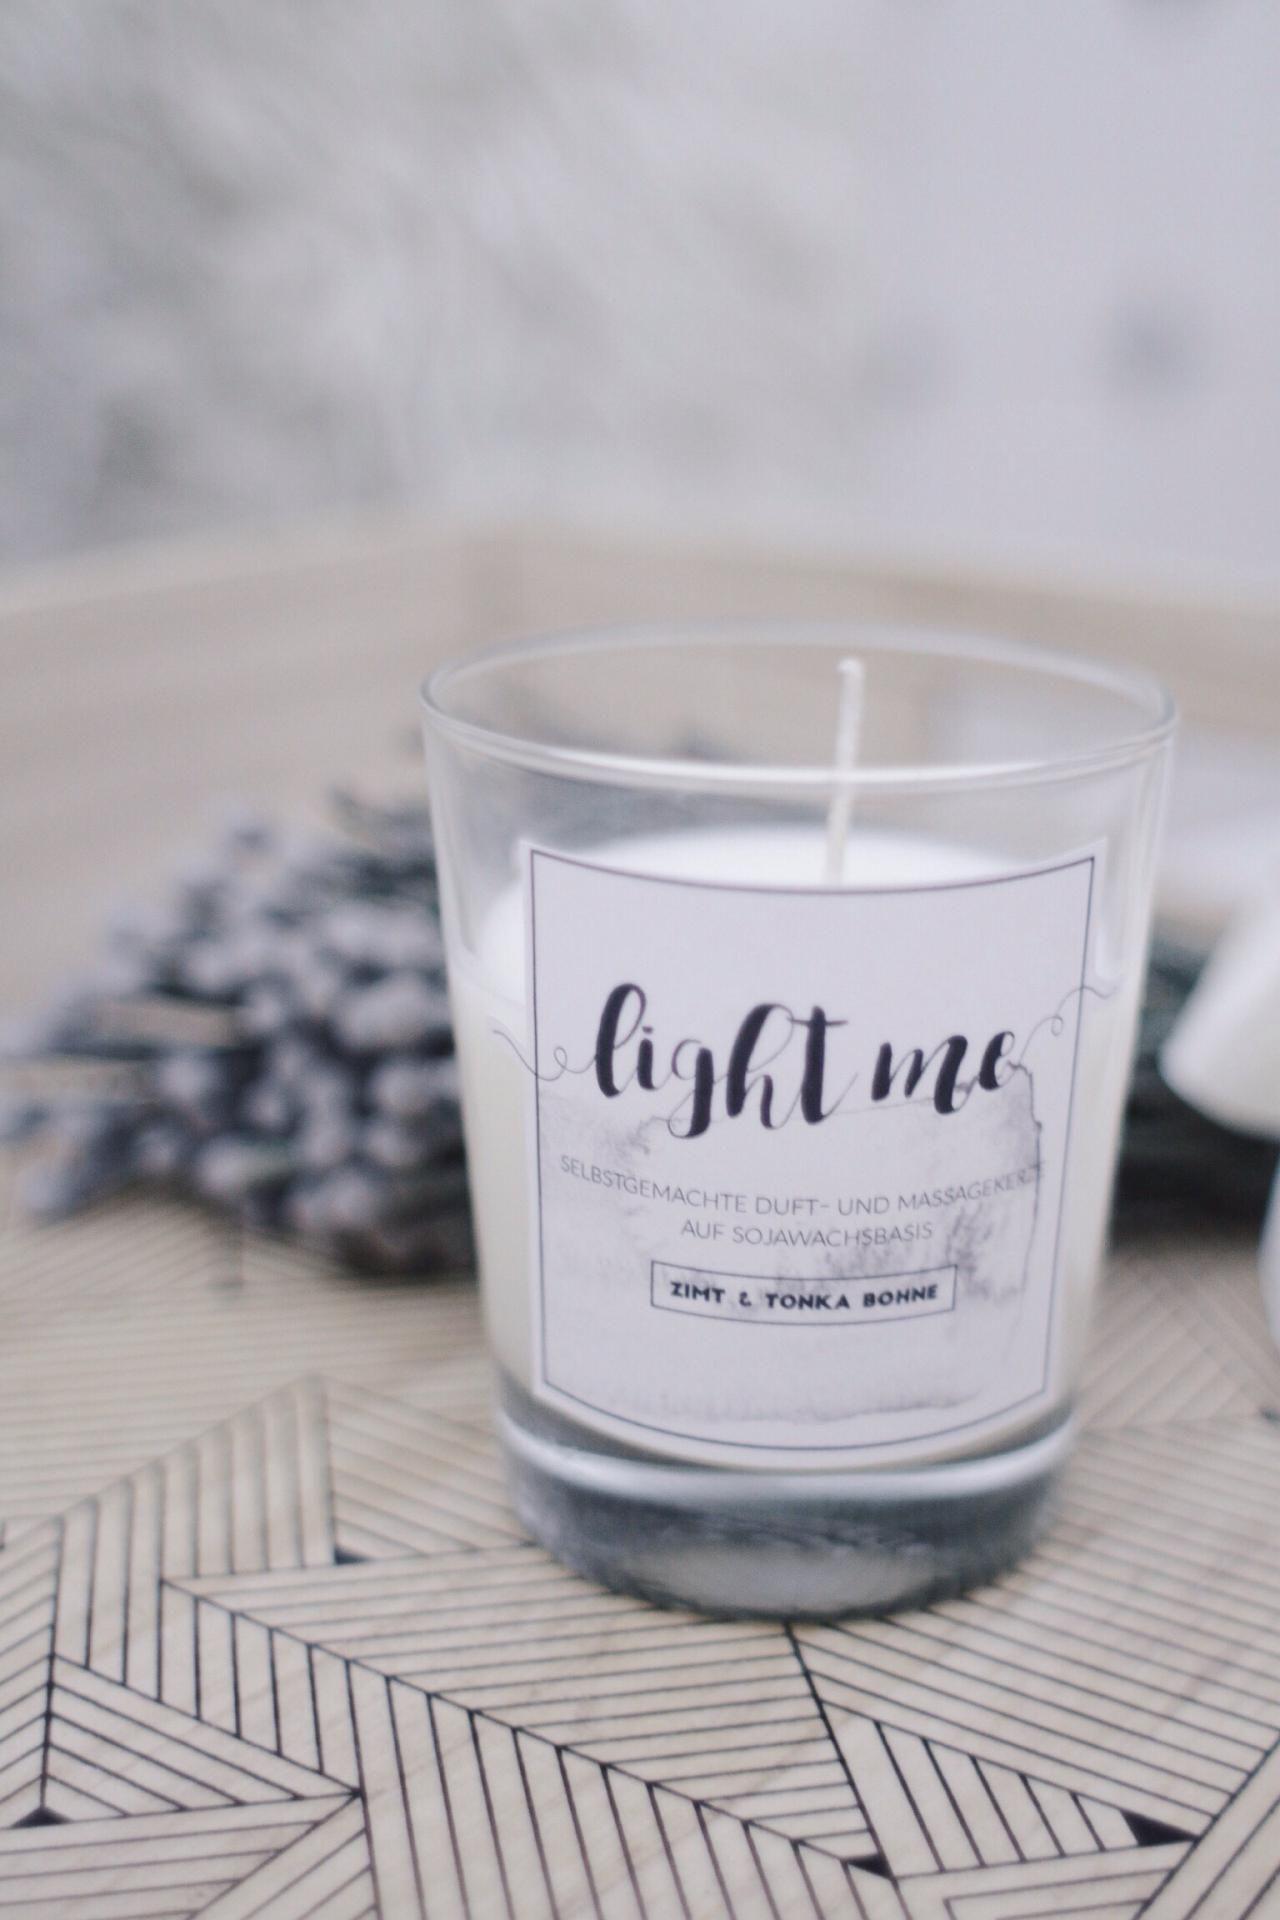 cozy winter duftkerzen f r zuhause diy beauty pinterest kerzen duft und geschenke. Black Bedroom Furniture Sets. Home Design Ideas